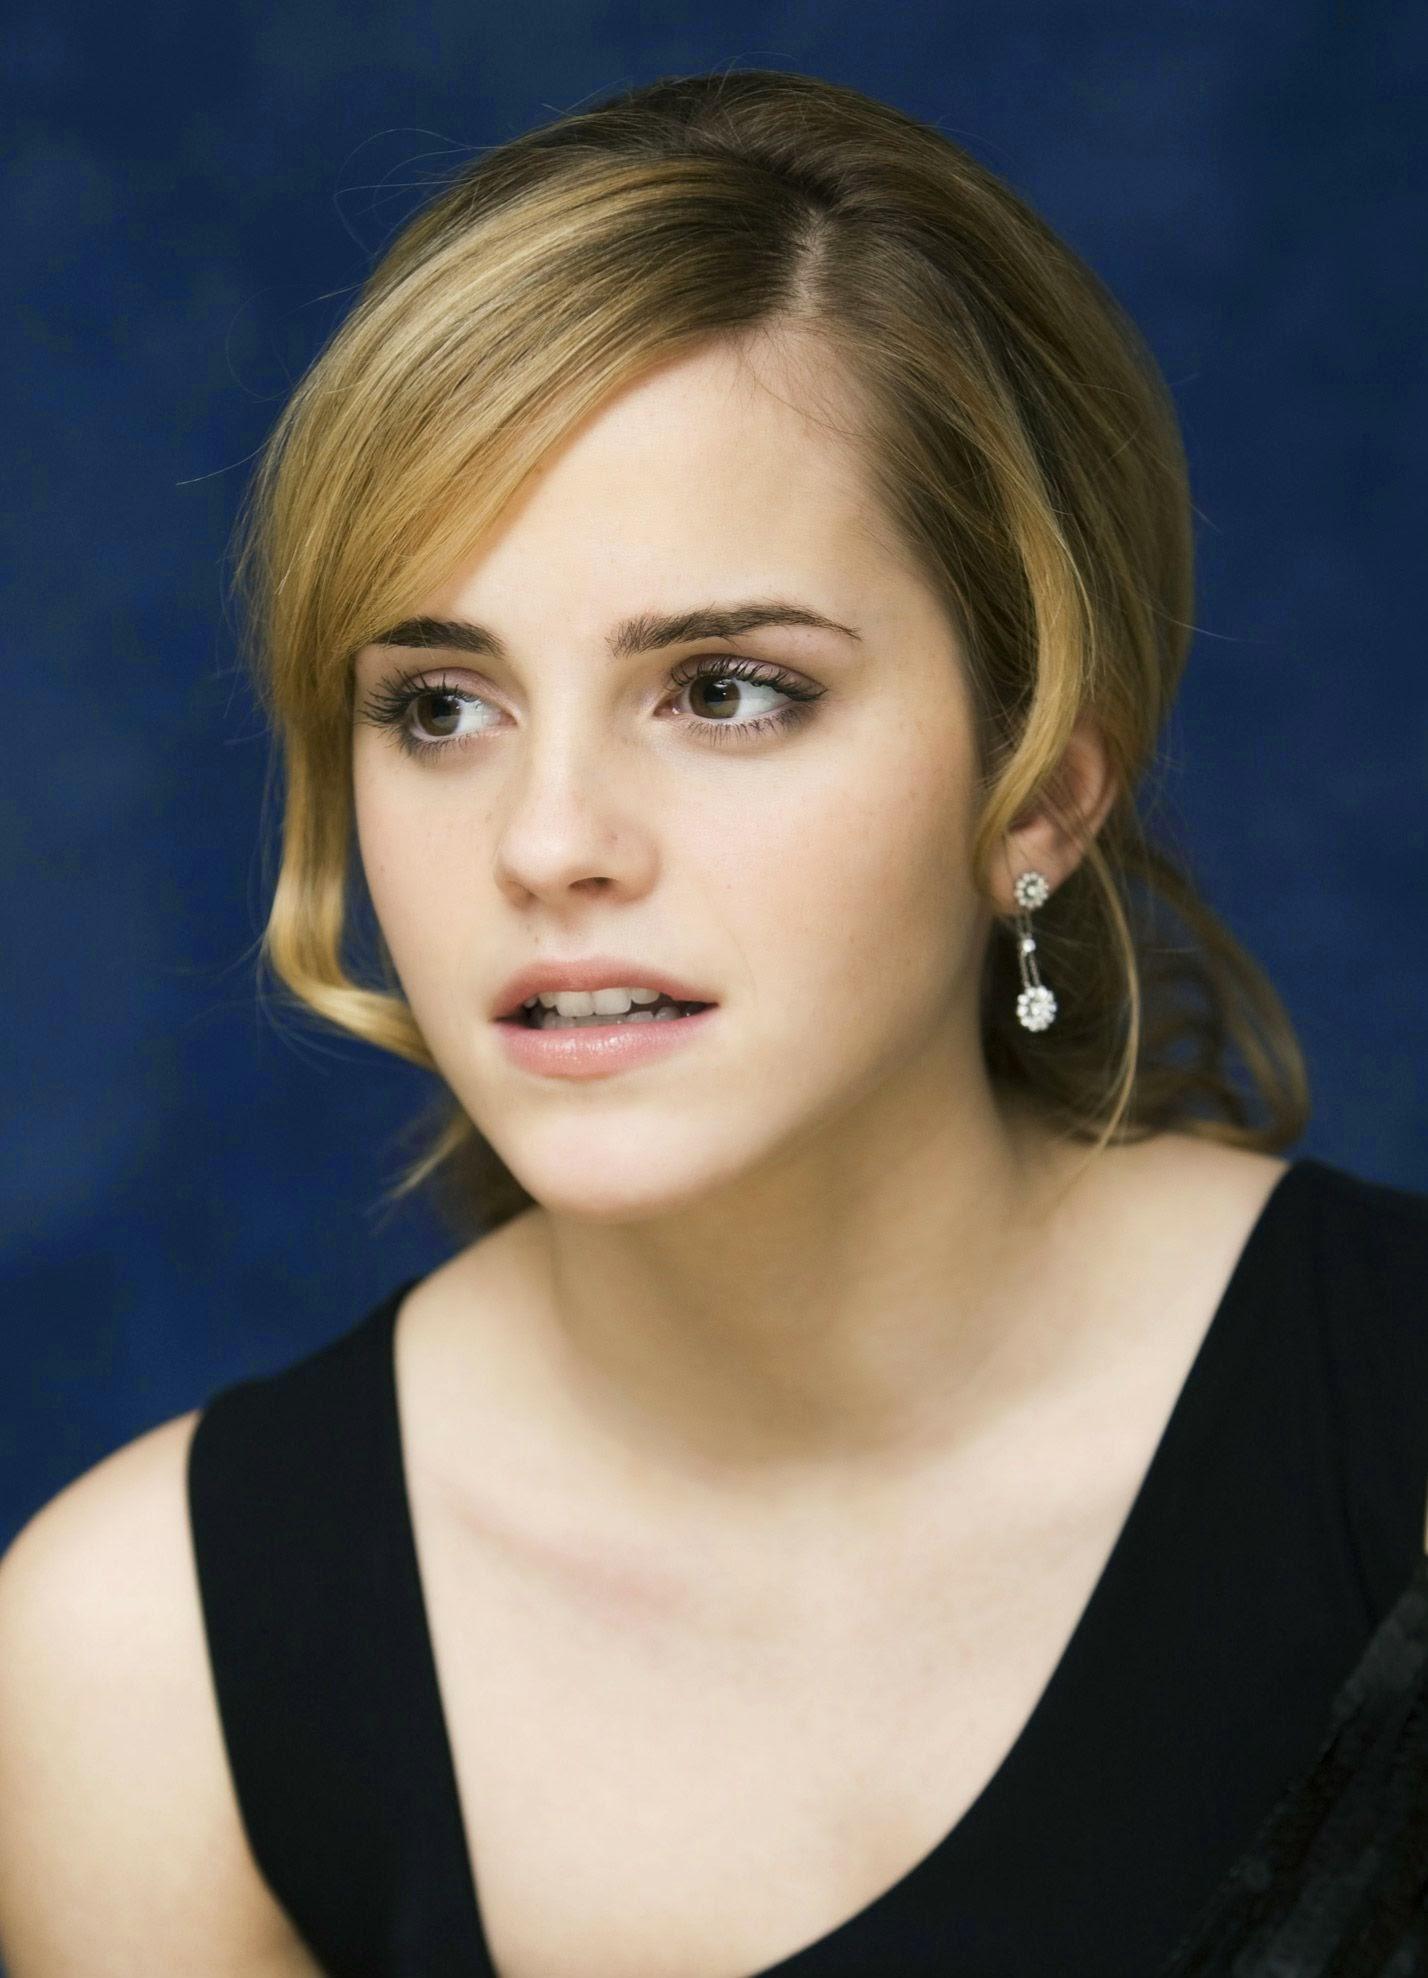 Emma Watson Hollywood Actress 40 Fantastic Photos: Emma Watson Pictures Gallery (80)